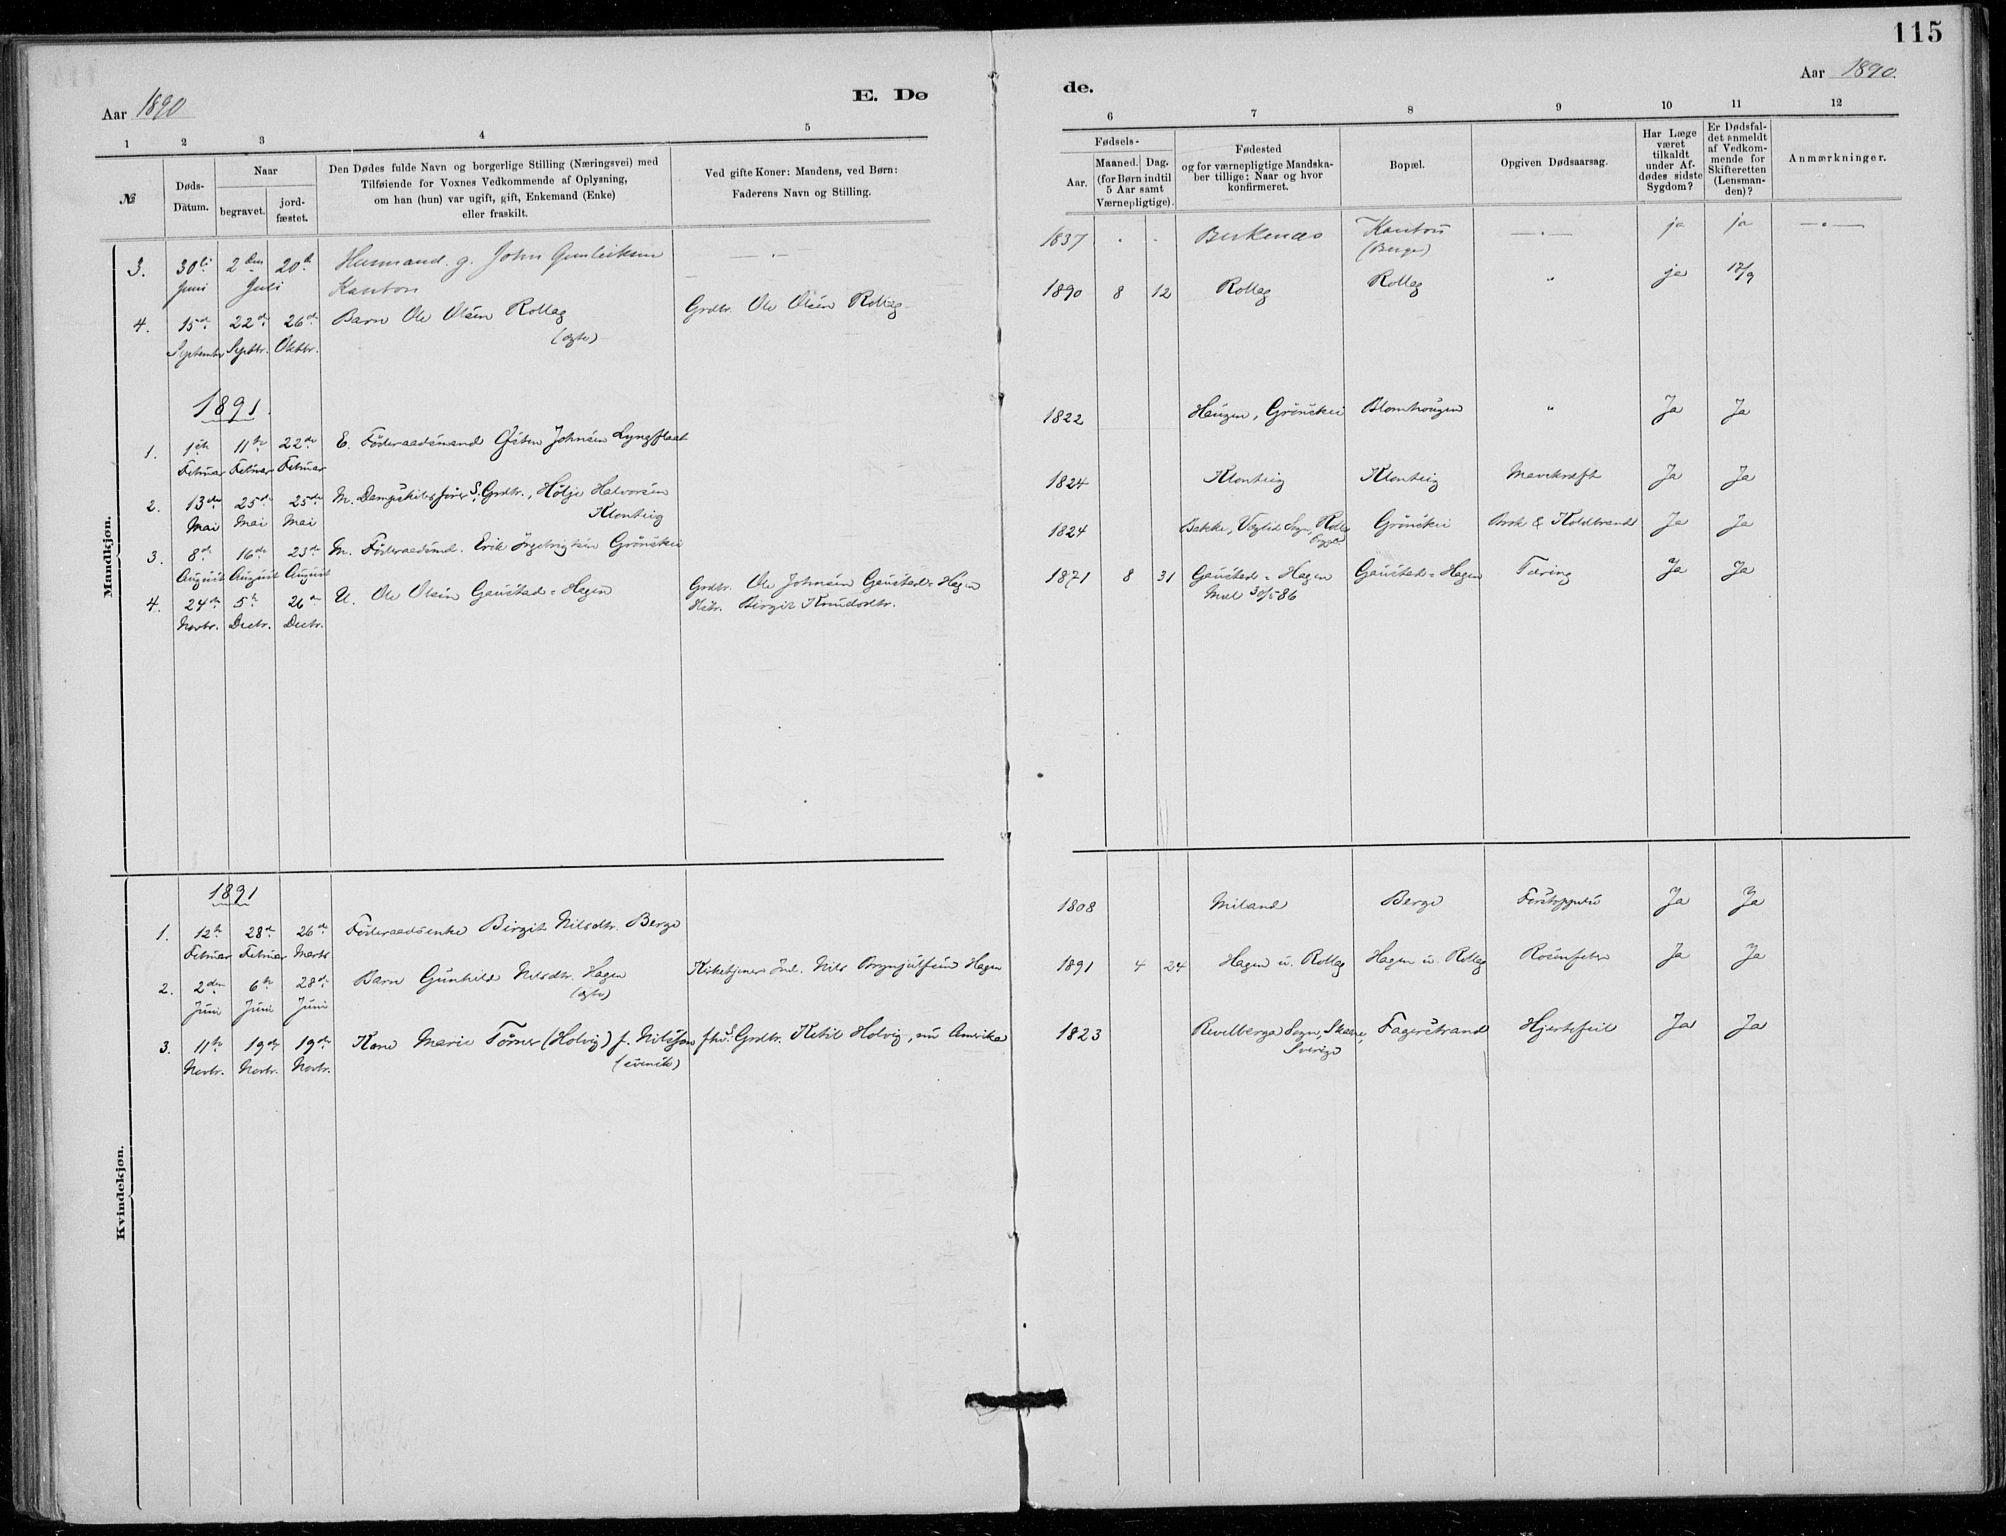 SAKO, Tinn kirkebøker, F/Fb/L0002: Ministerialbok nr. II 2, 1878-1917, s. 115